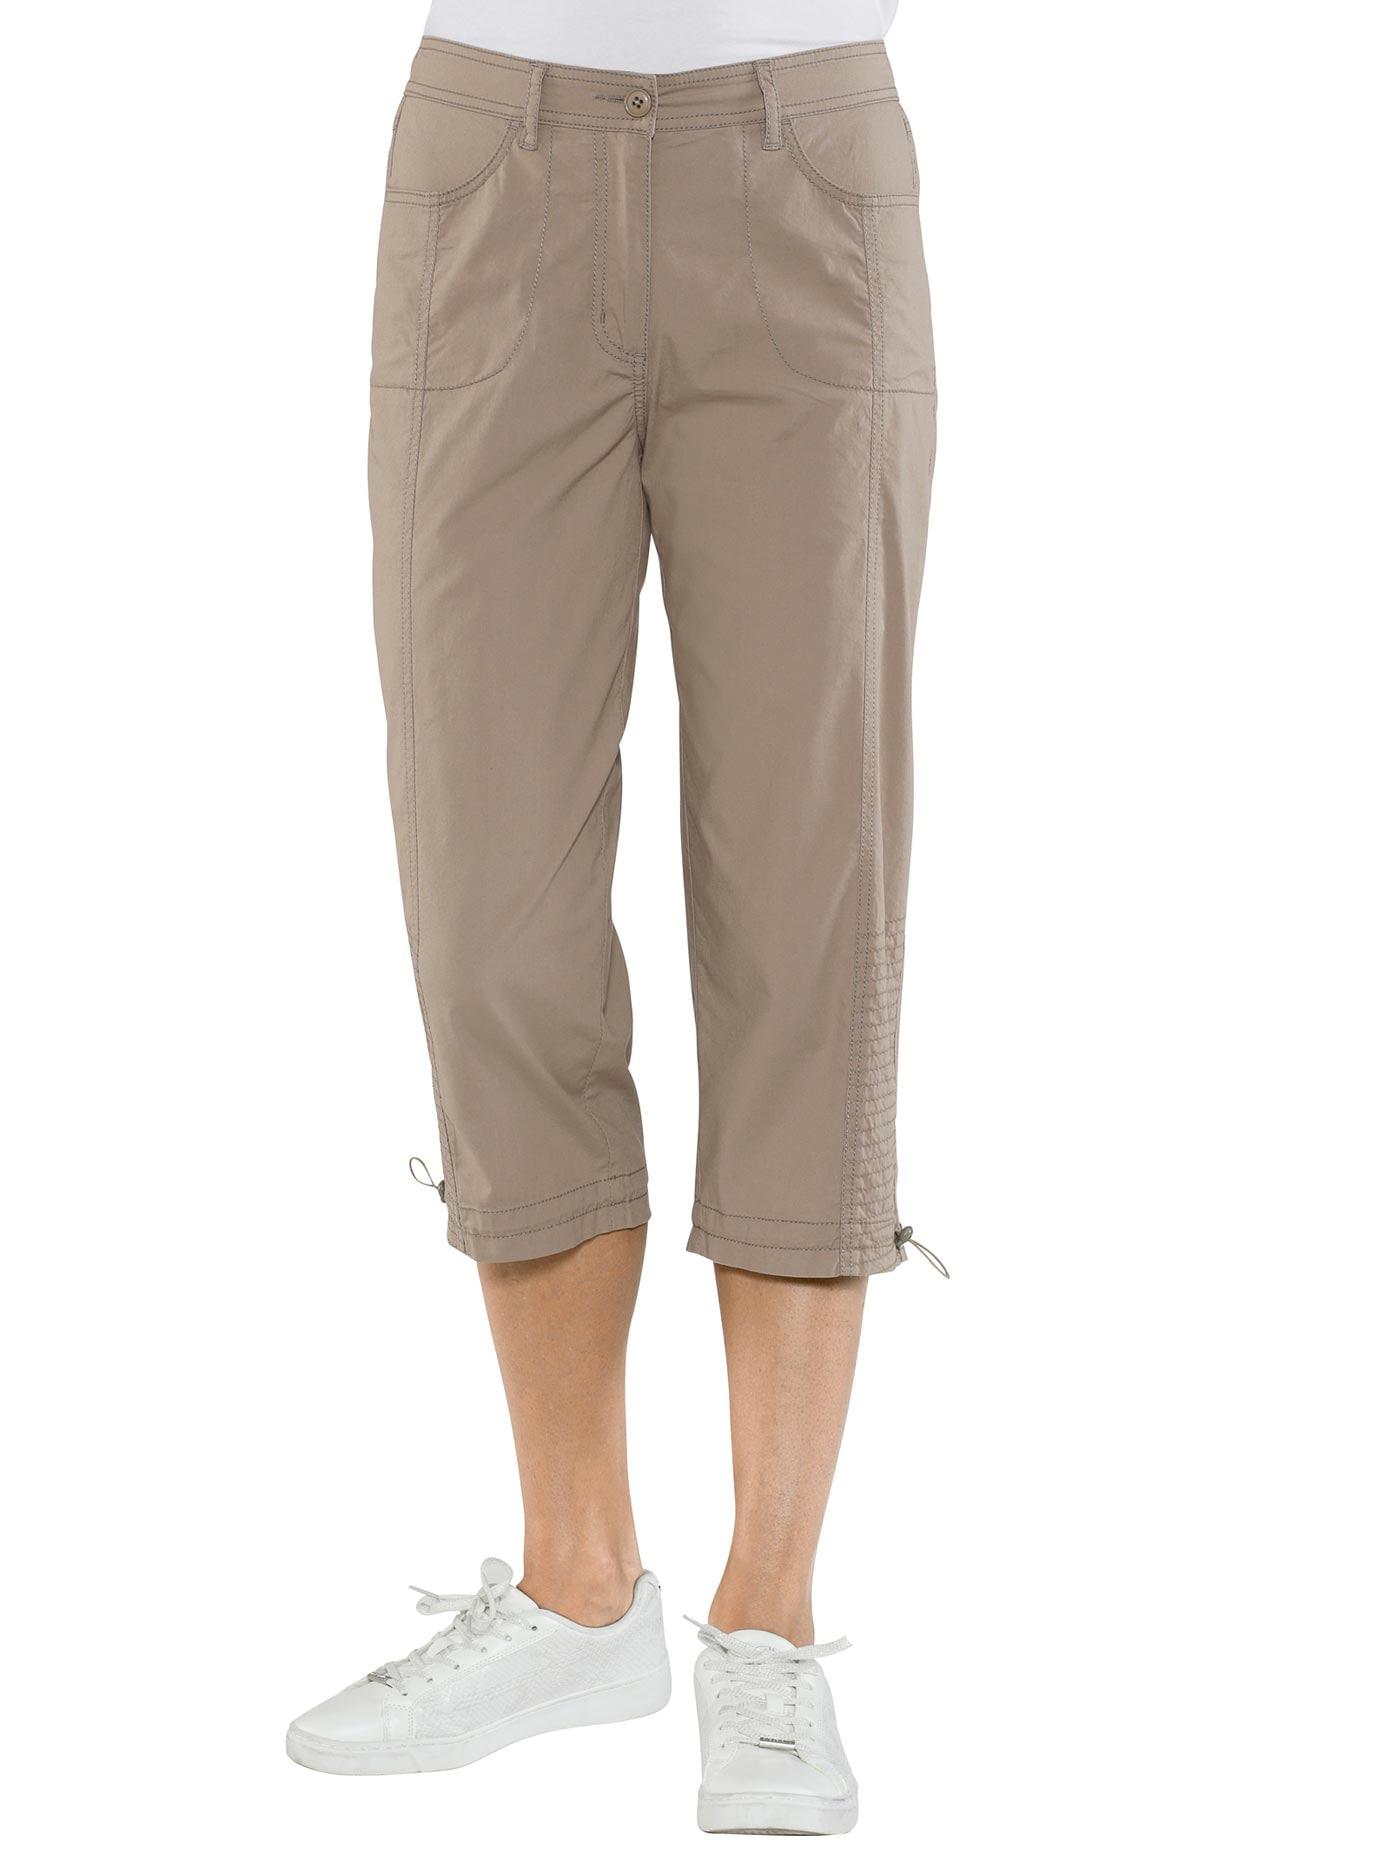 Casual Looks Capri-Hose mit rückwärtigem Dehnbund | Bekleidung > Hosen > Caprihosen | Braun | Casual Looks